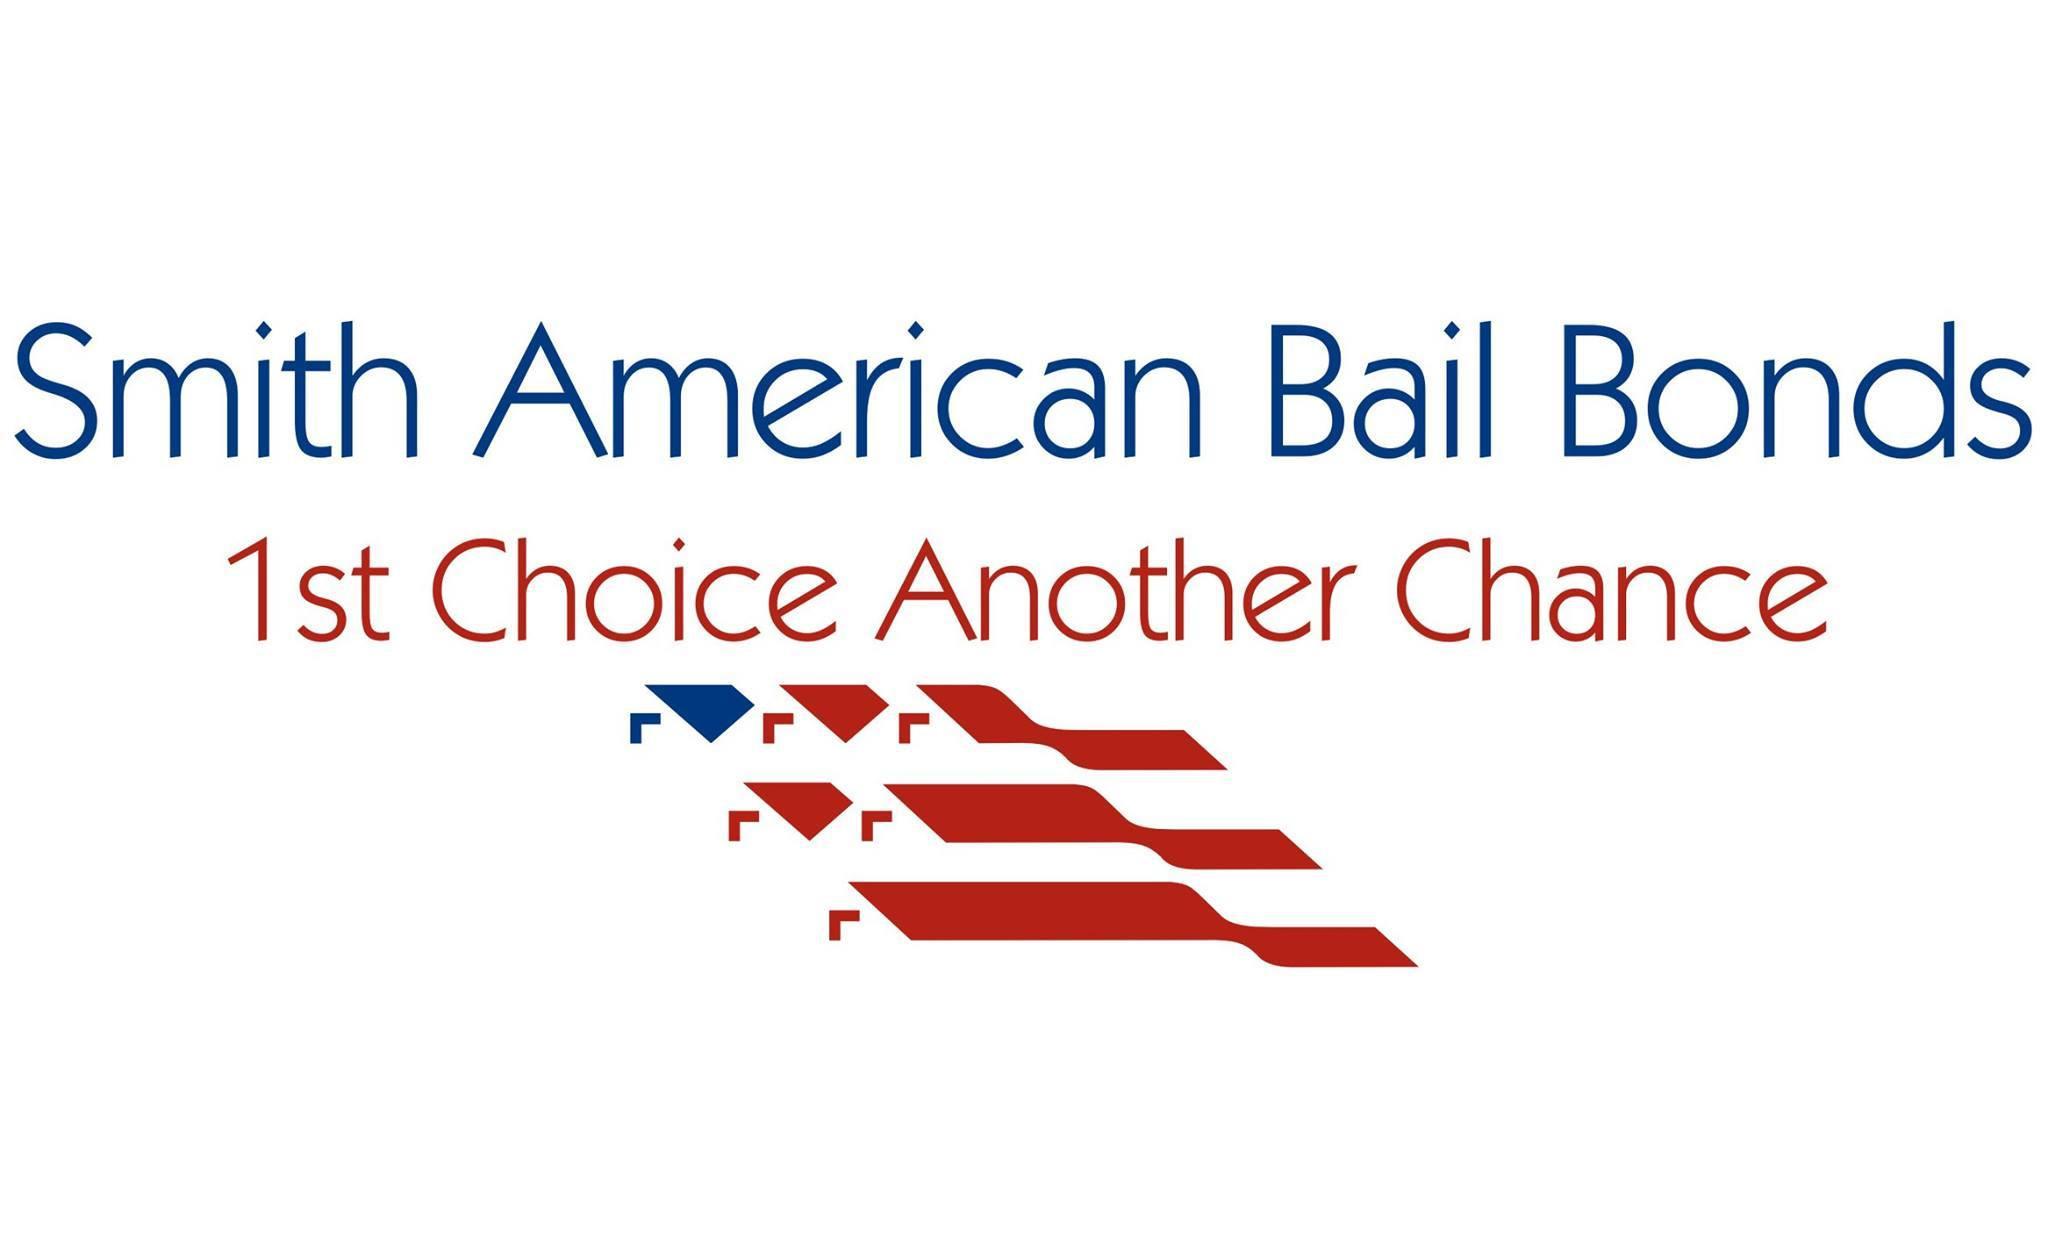 Smith American Bail Bonds